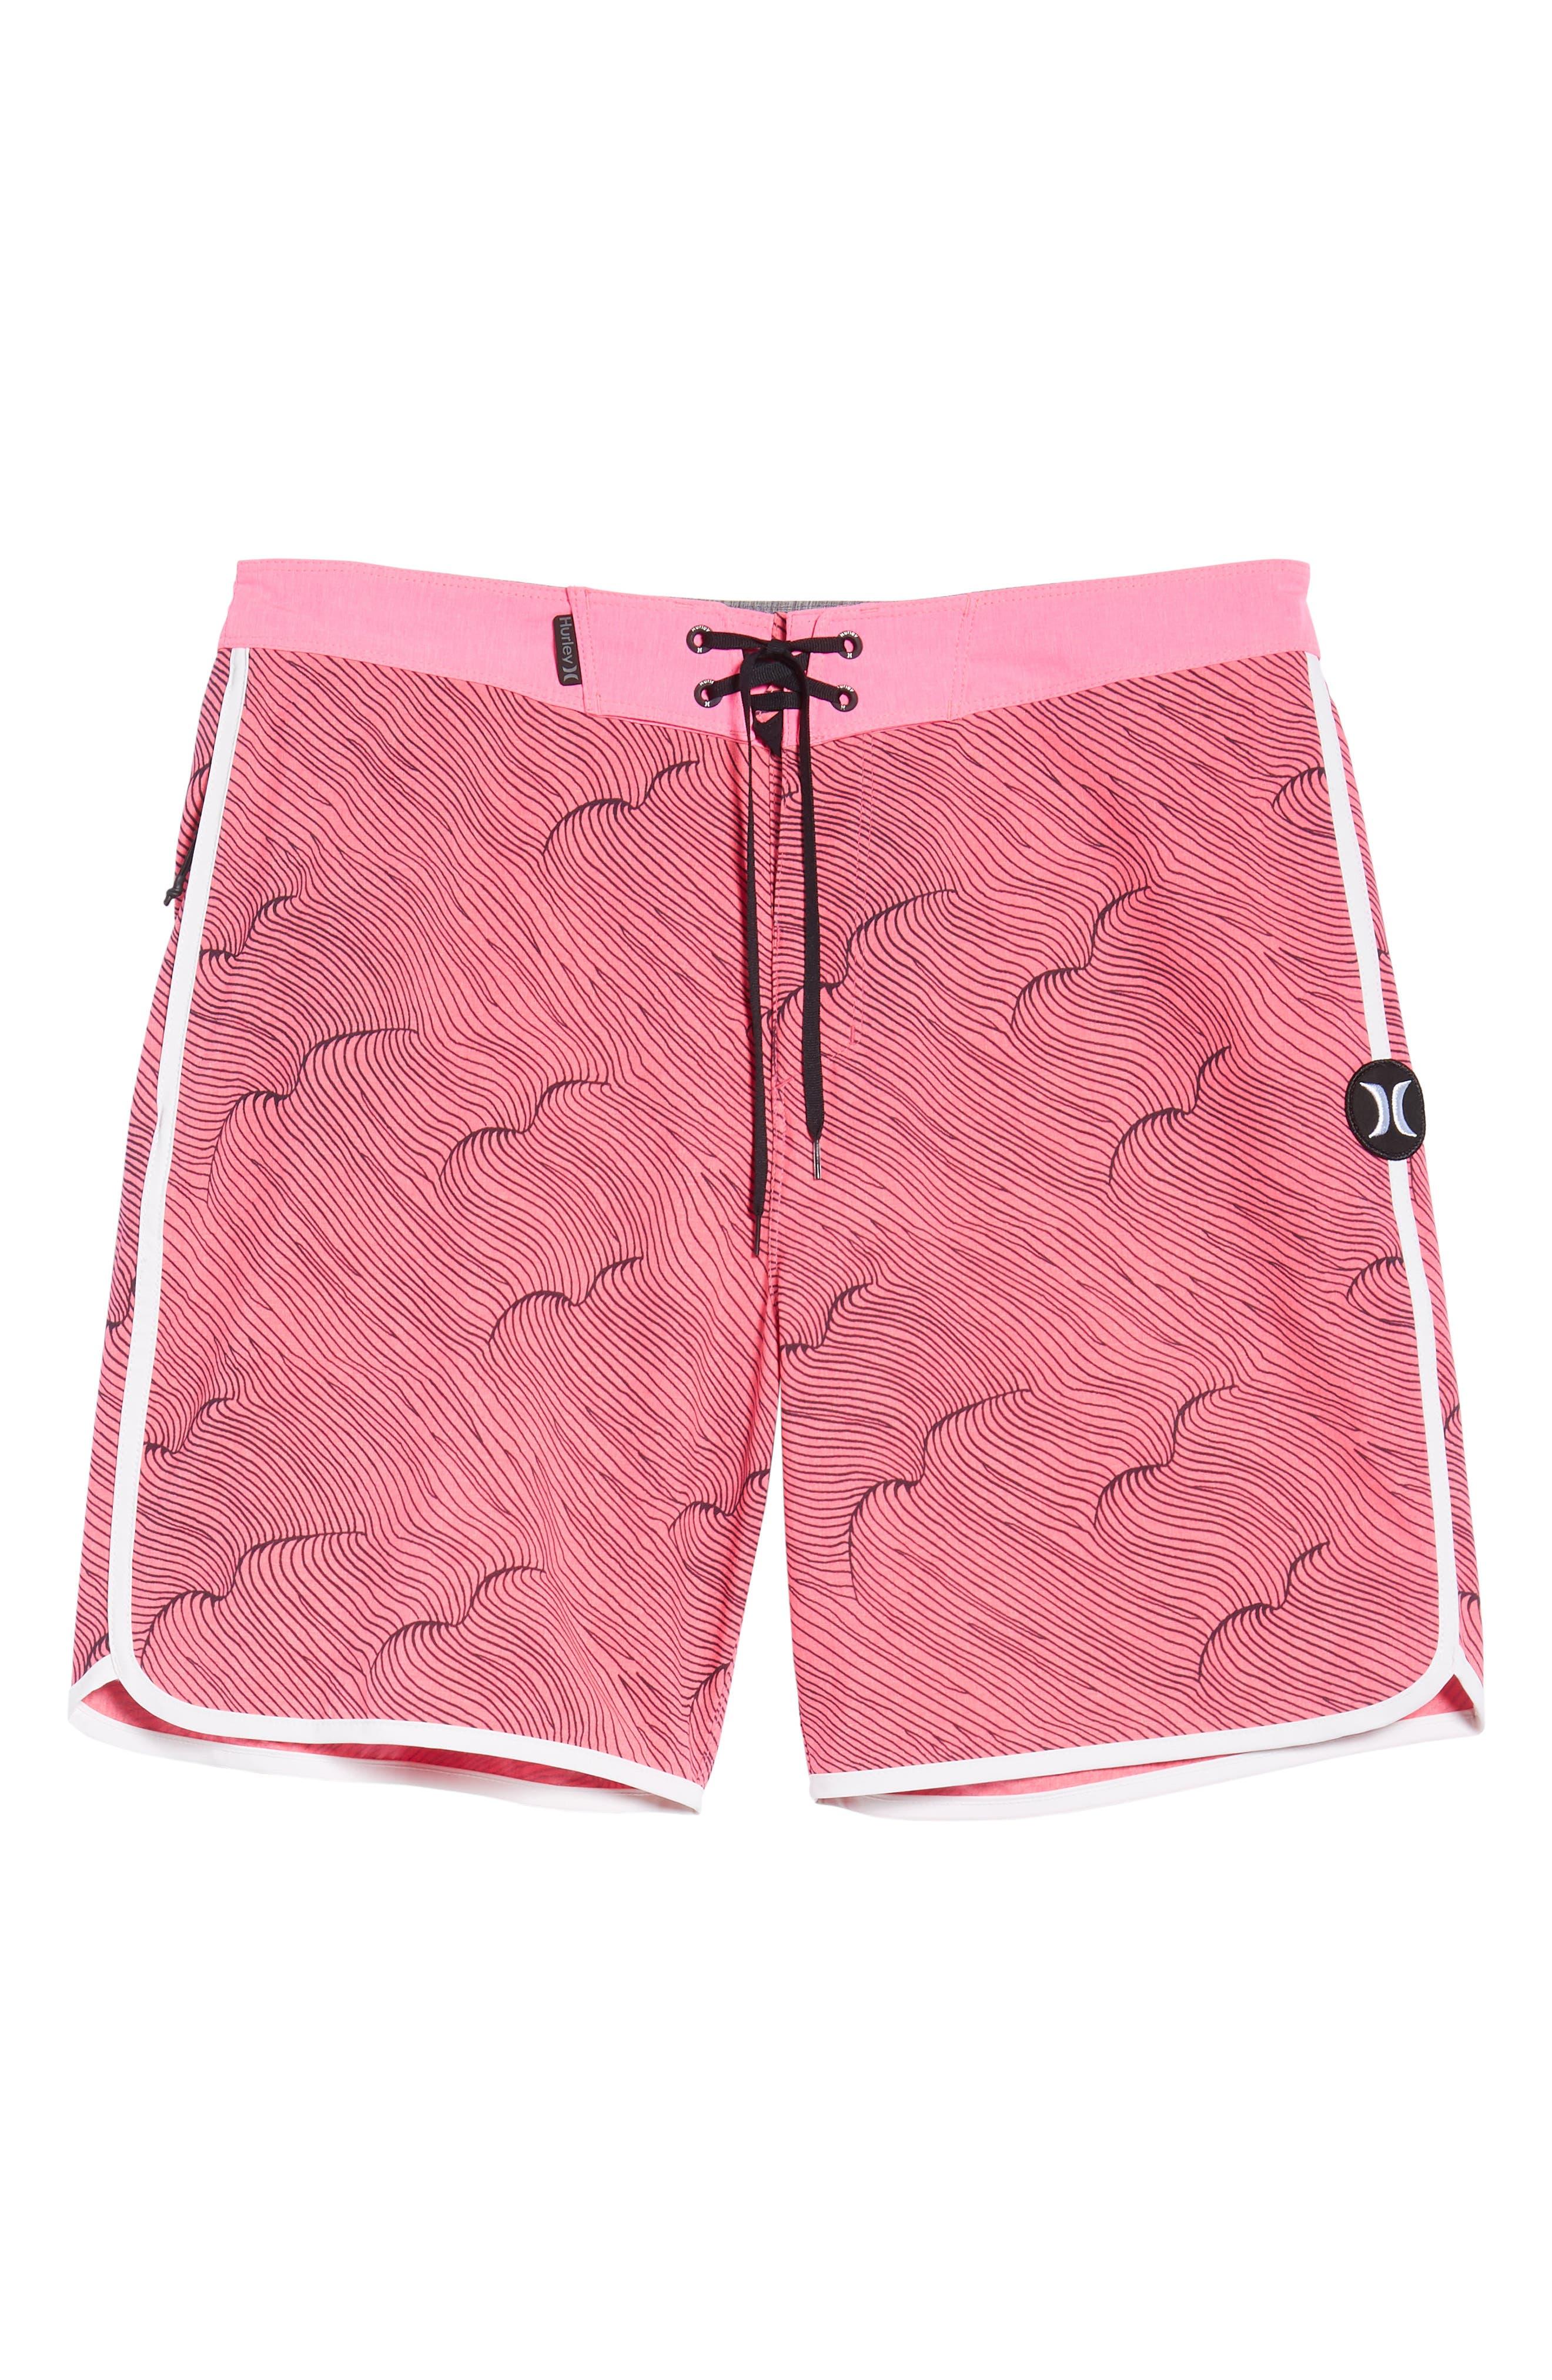 Phantom Thalia Street Board Shorts,                             Alternate thumbnail 6, color,                             Hyper Pink/Black